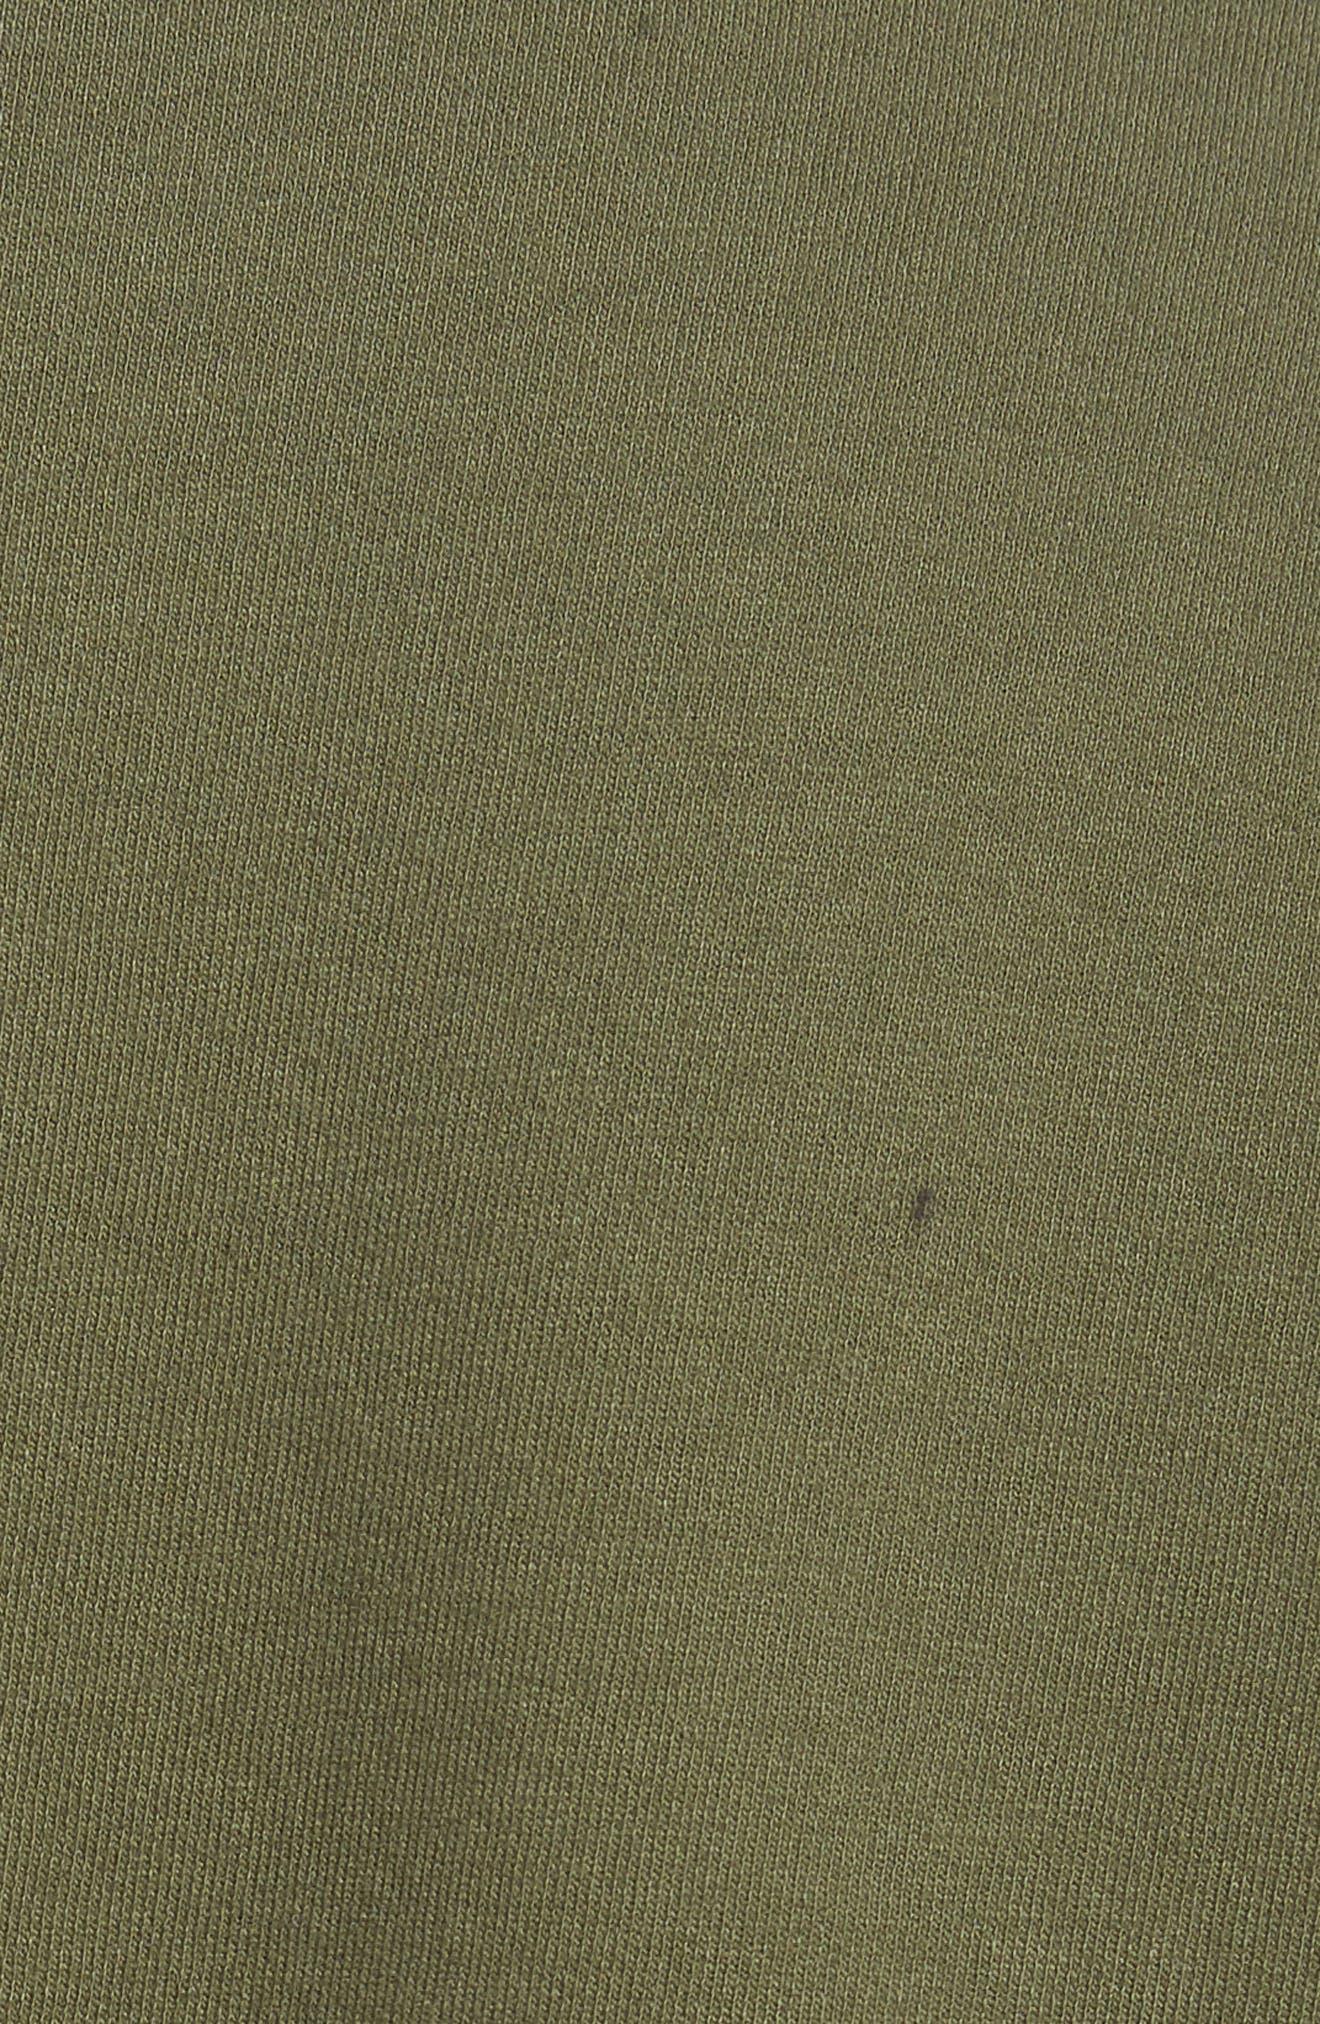 Splice Sweatshirt,                             Alternate thumbnail 5, color,                             311